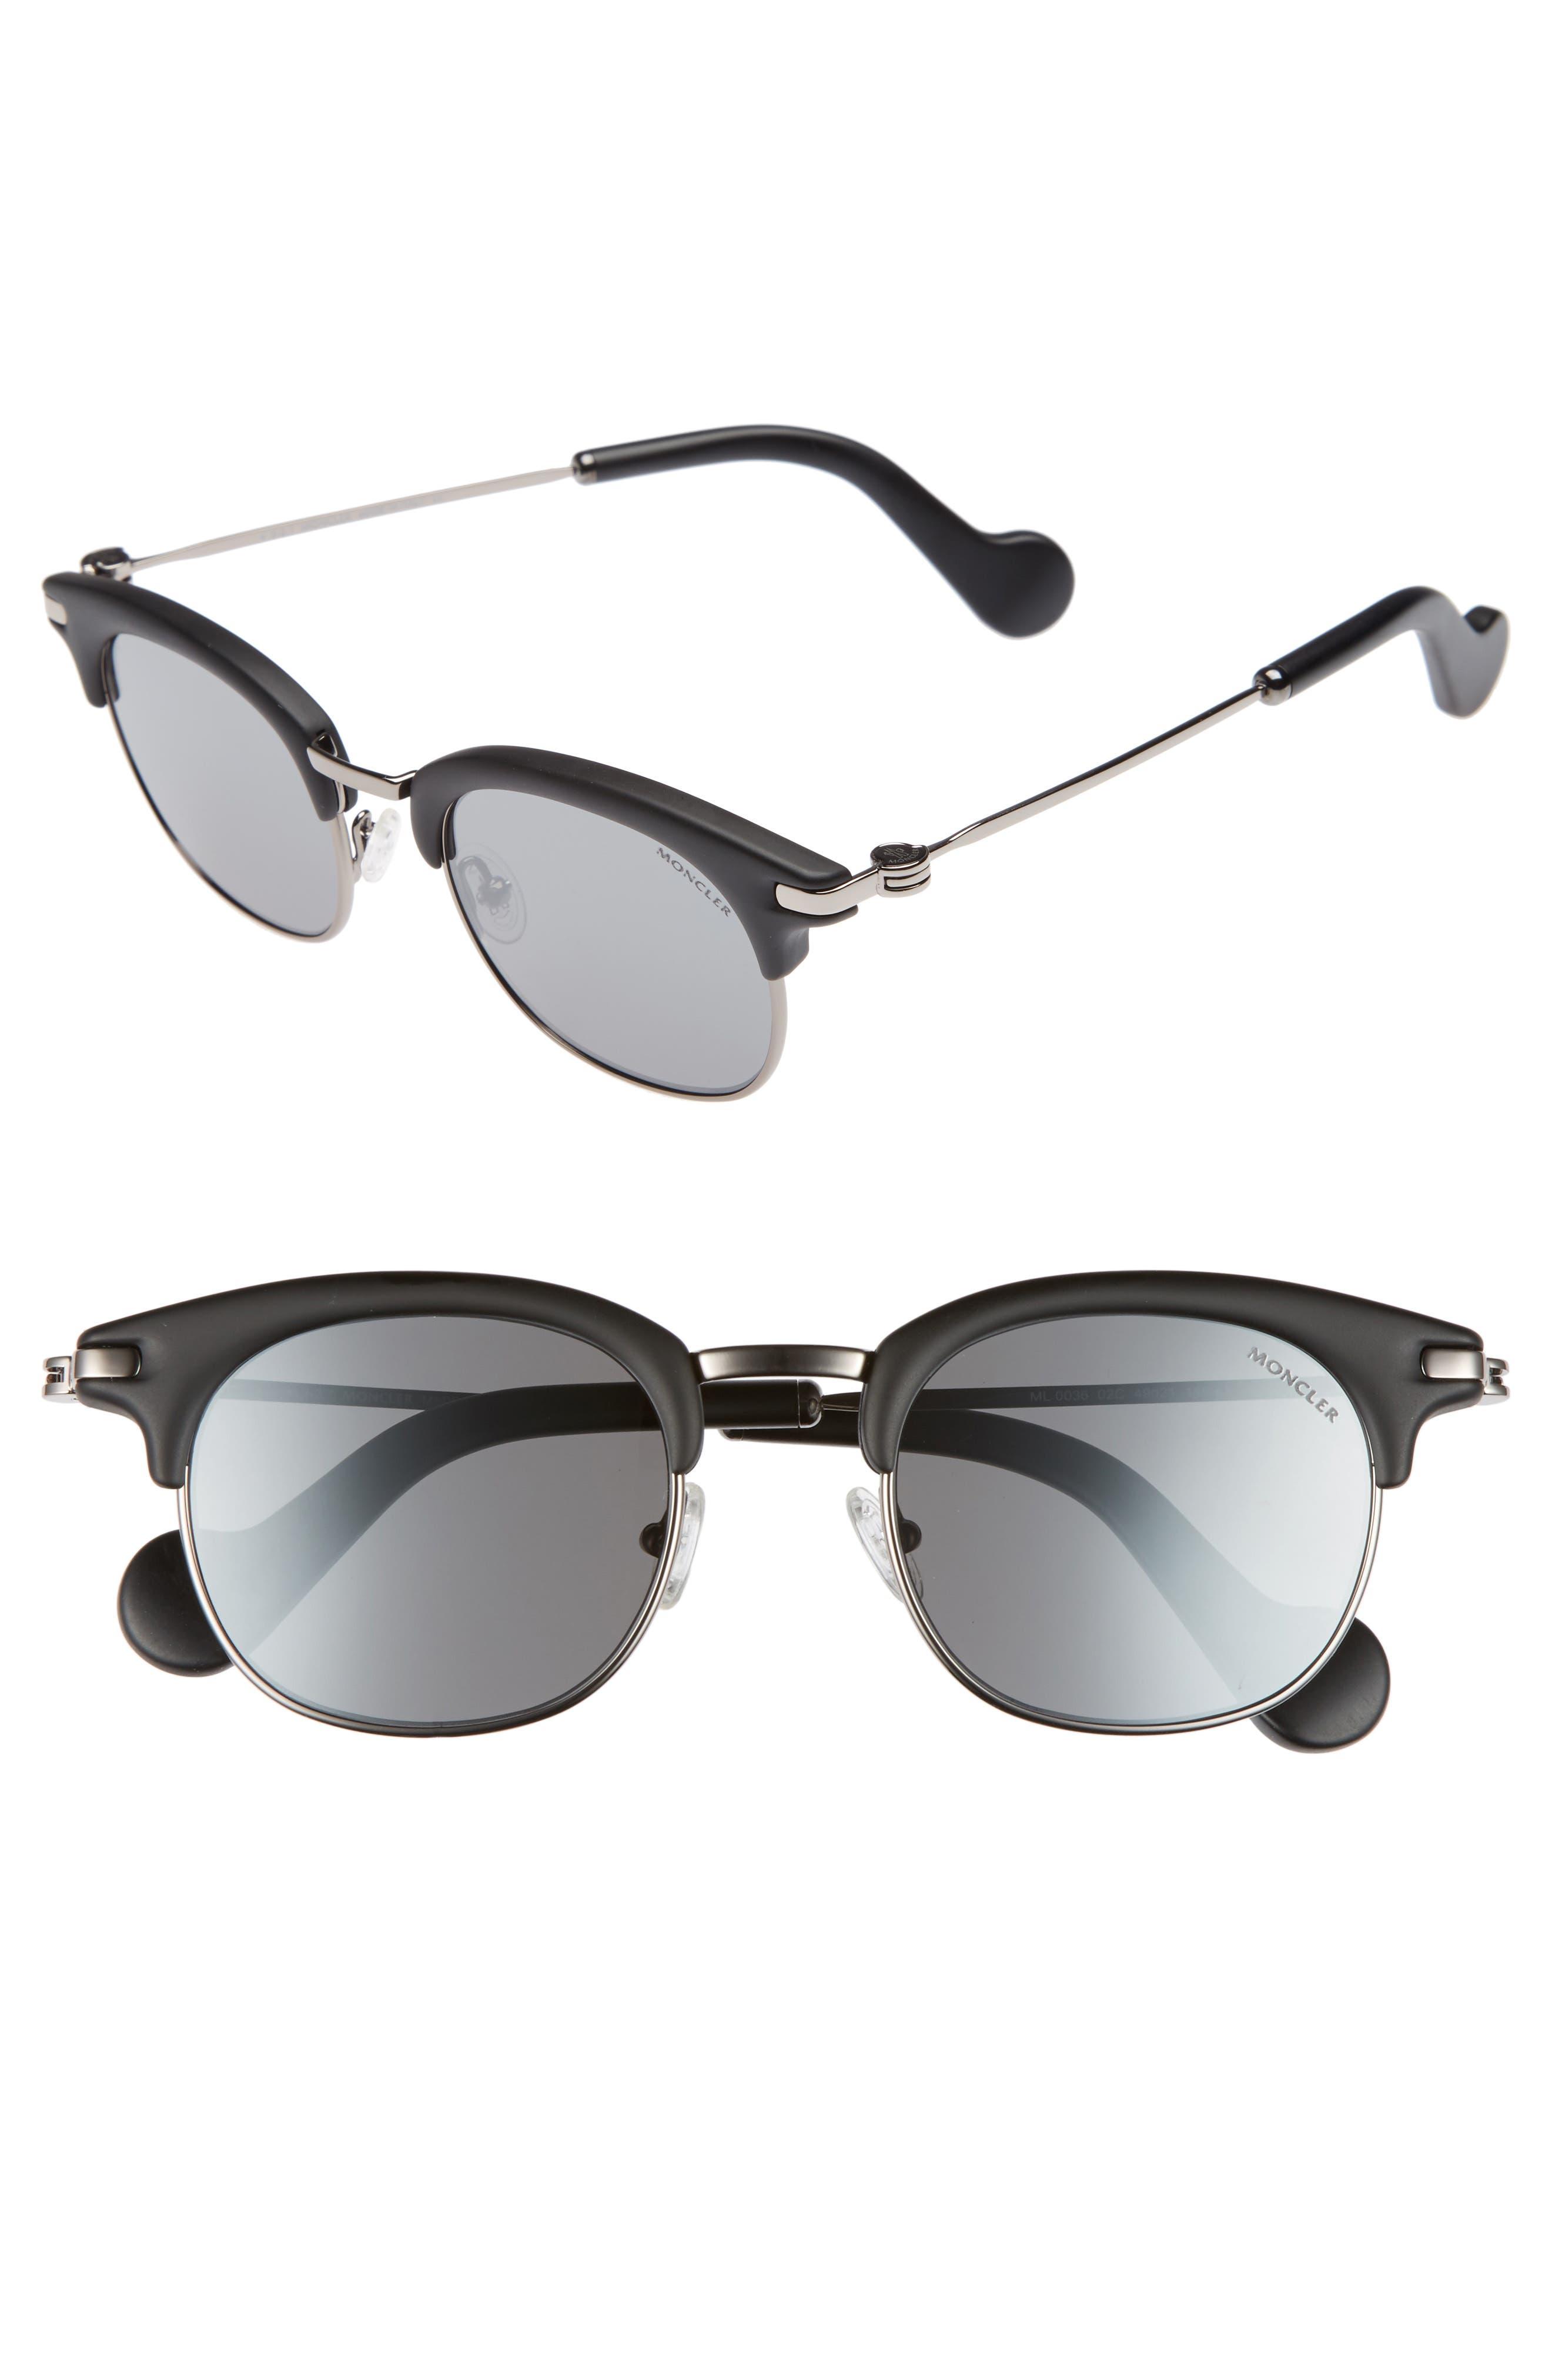 49mm Sunglasses,                             Main thumbnail 1, color,                             MATTE BLACK/ RUTHENIUM